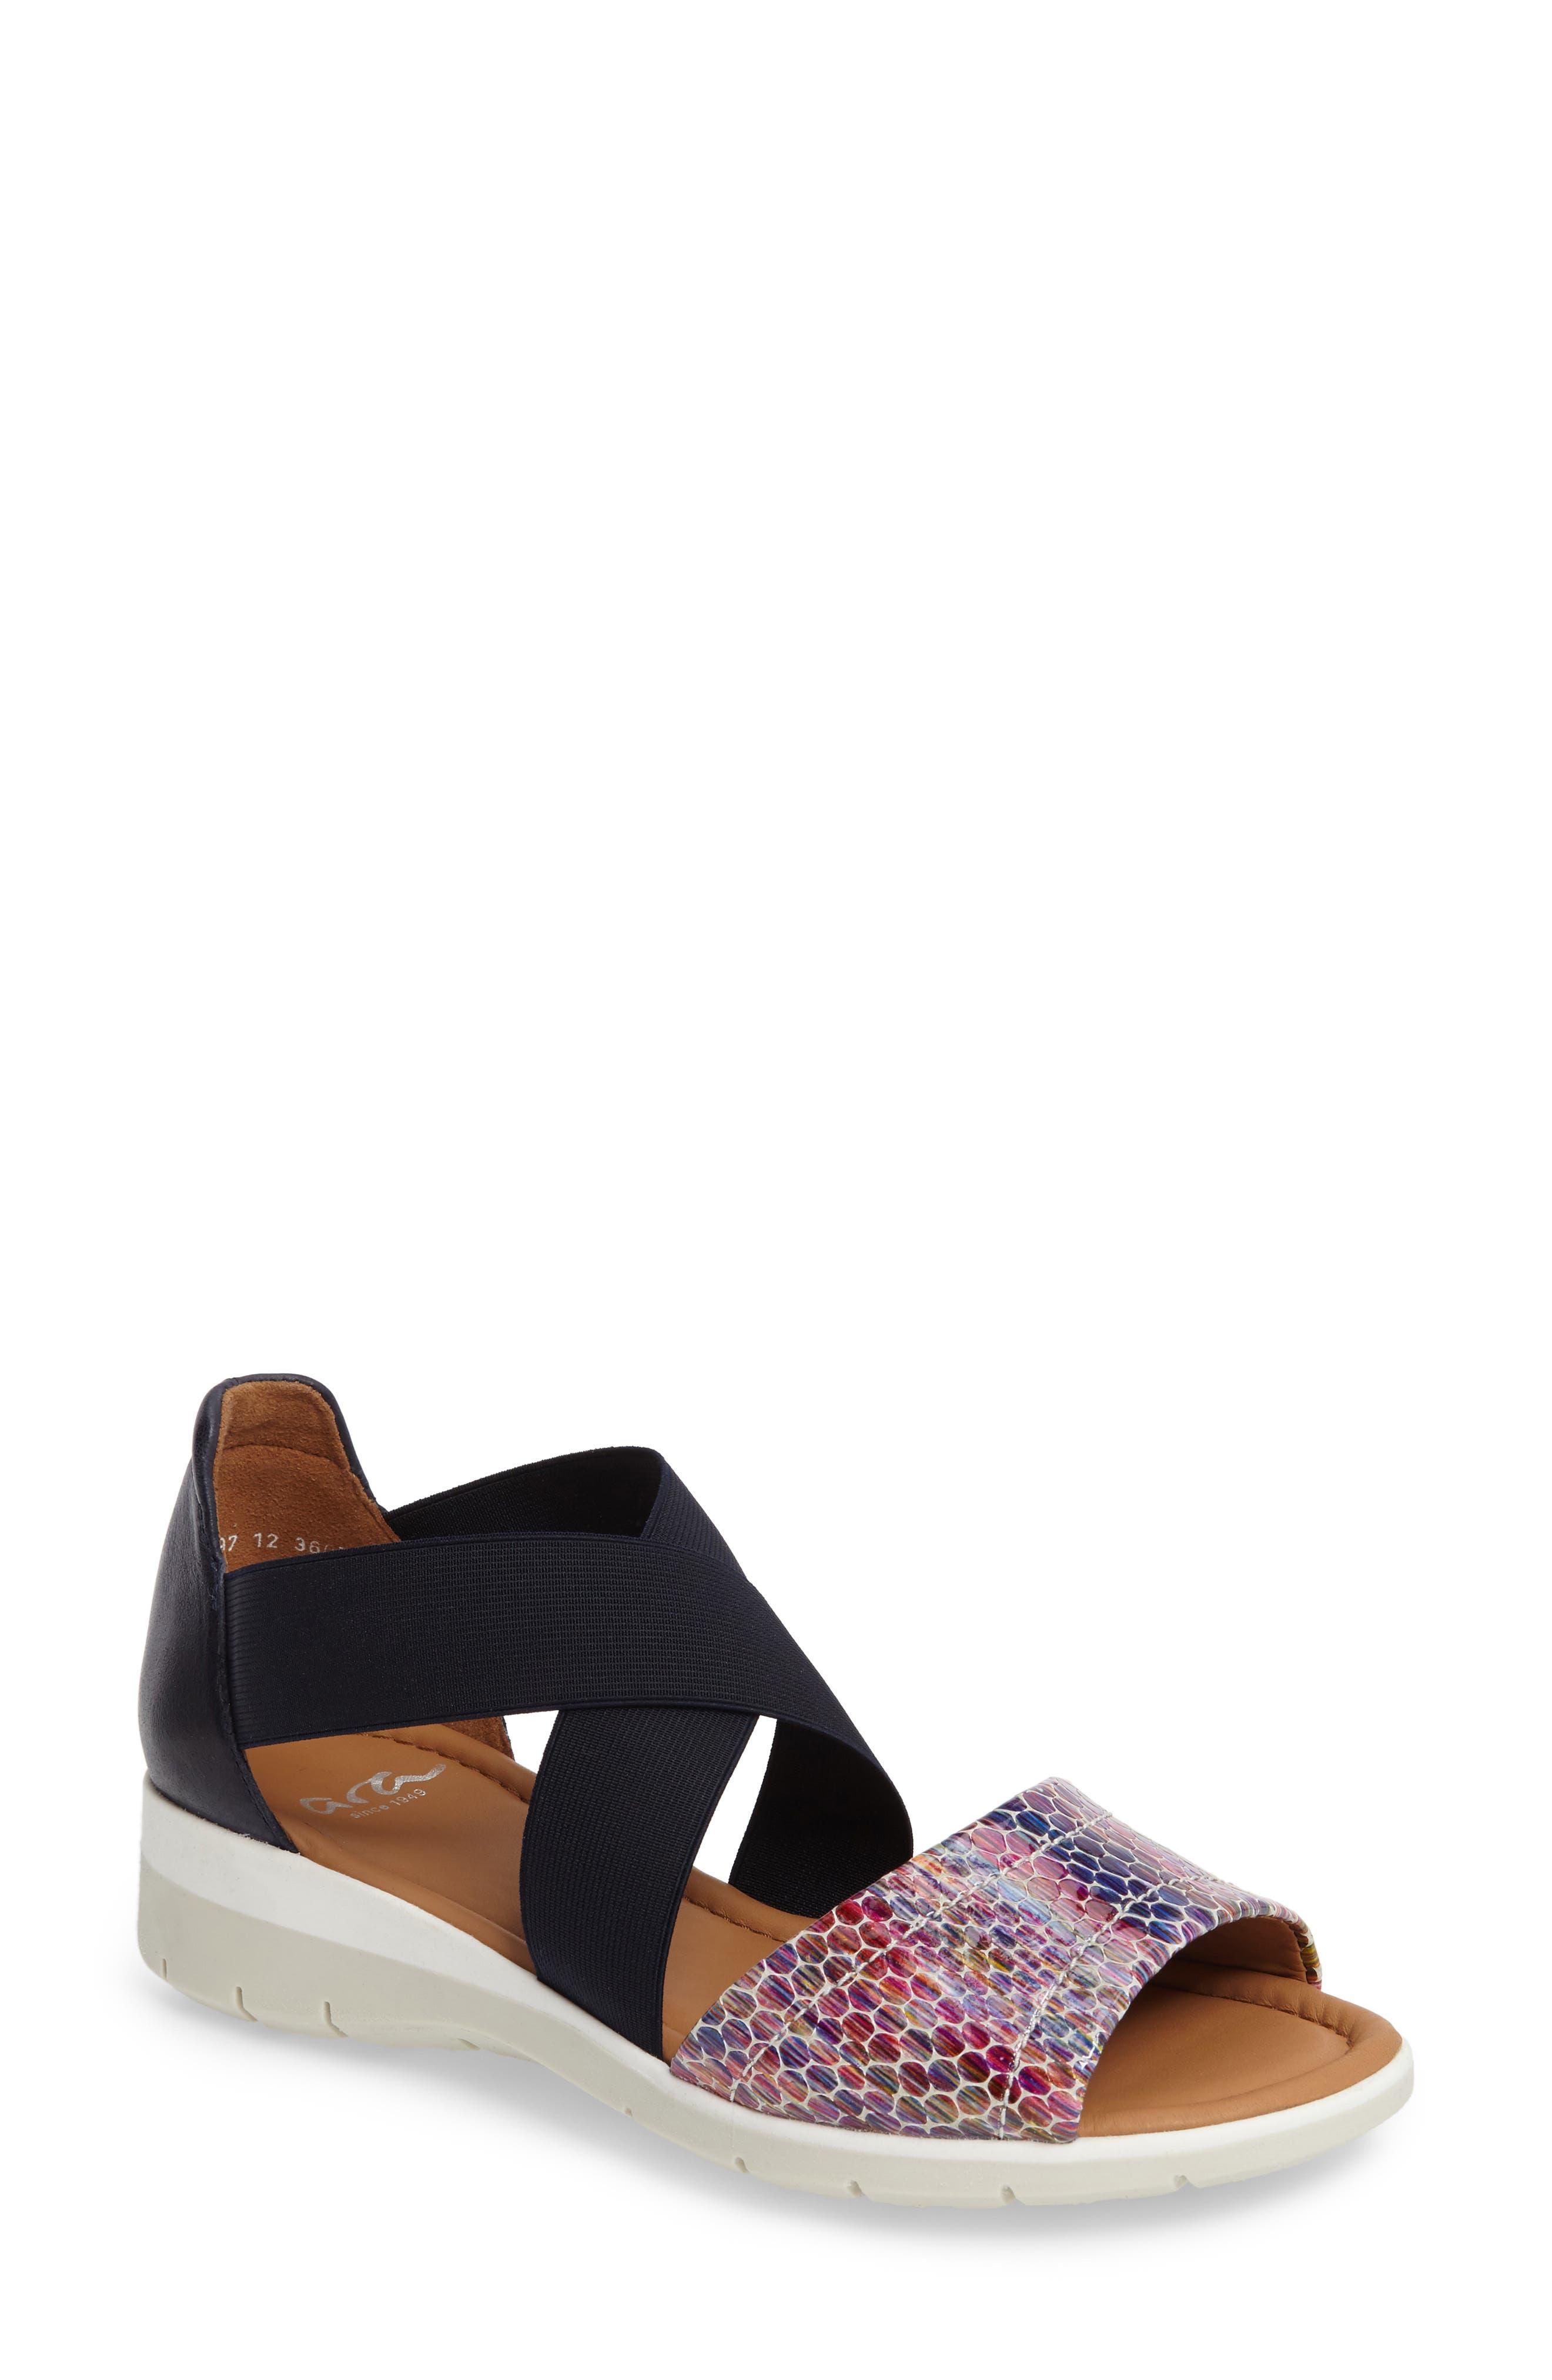 Larissa Cross Strap Wedge Sandal,                         Main,                         color, BLACK MULTI LEATHER